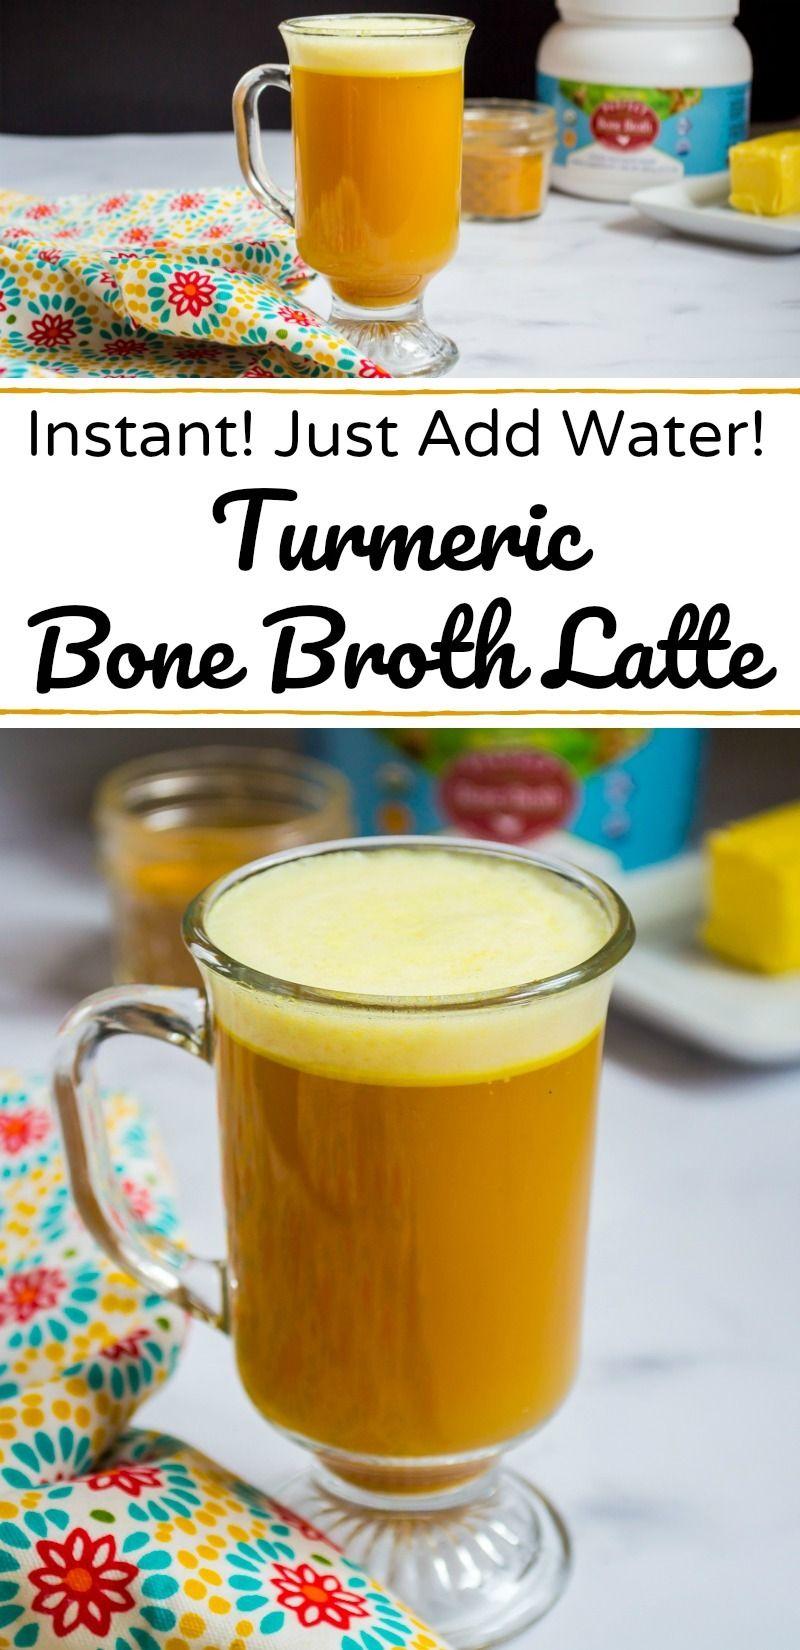 Instant Turmeric Bone Broth Latte Recipe Bone broth